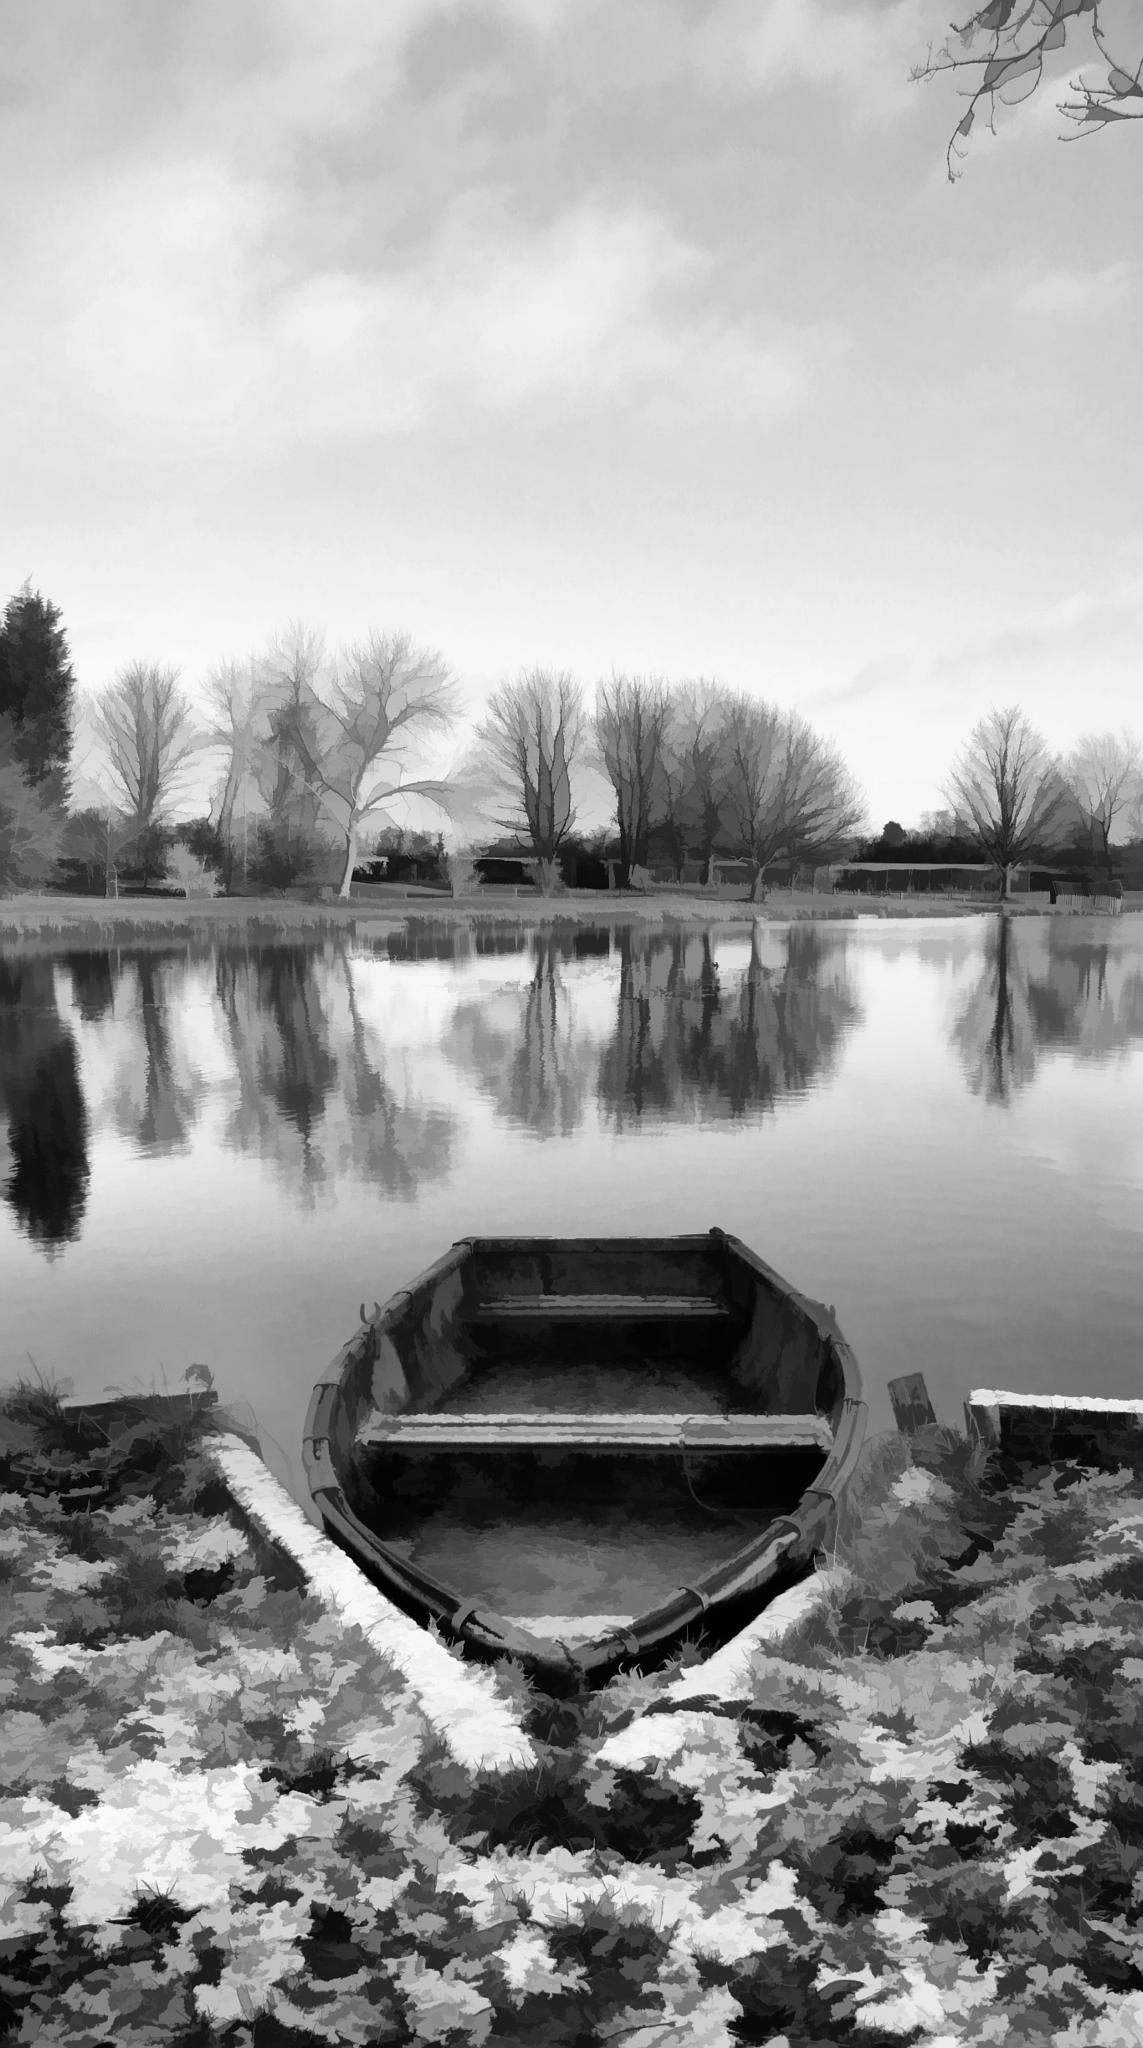 Moored Boat (Black & White) by Anthony Tlolka